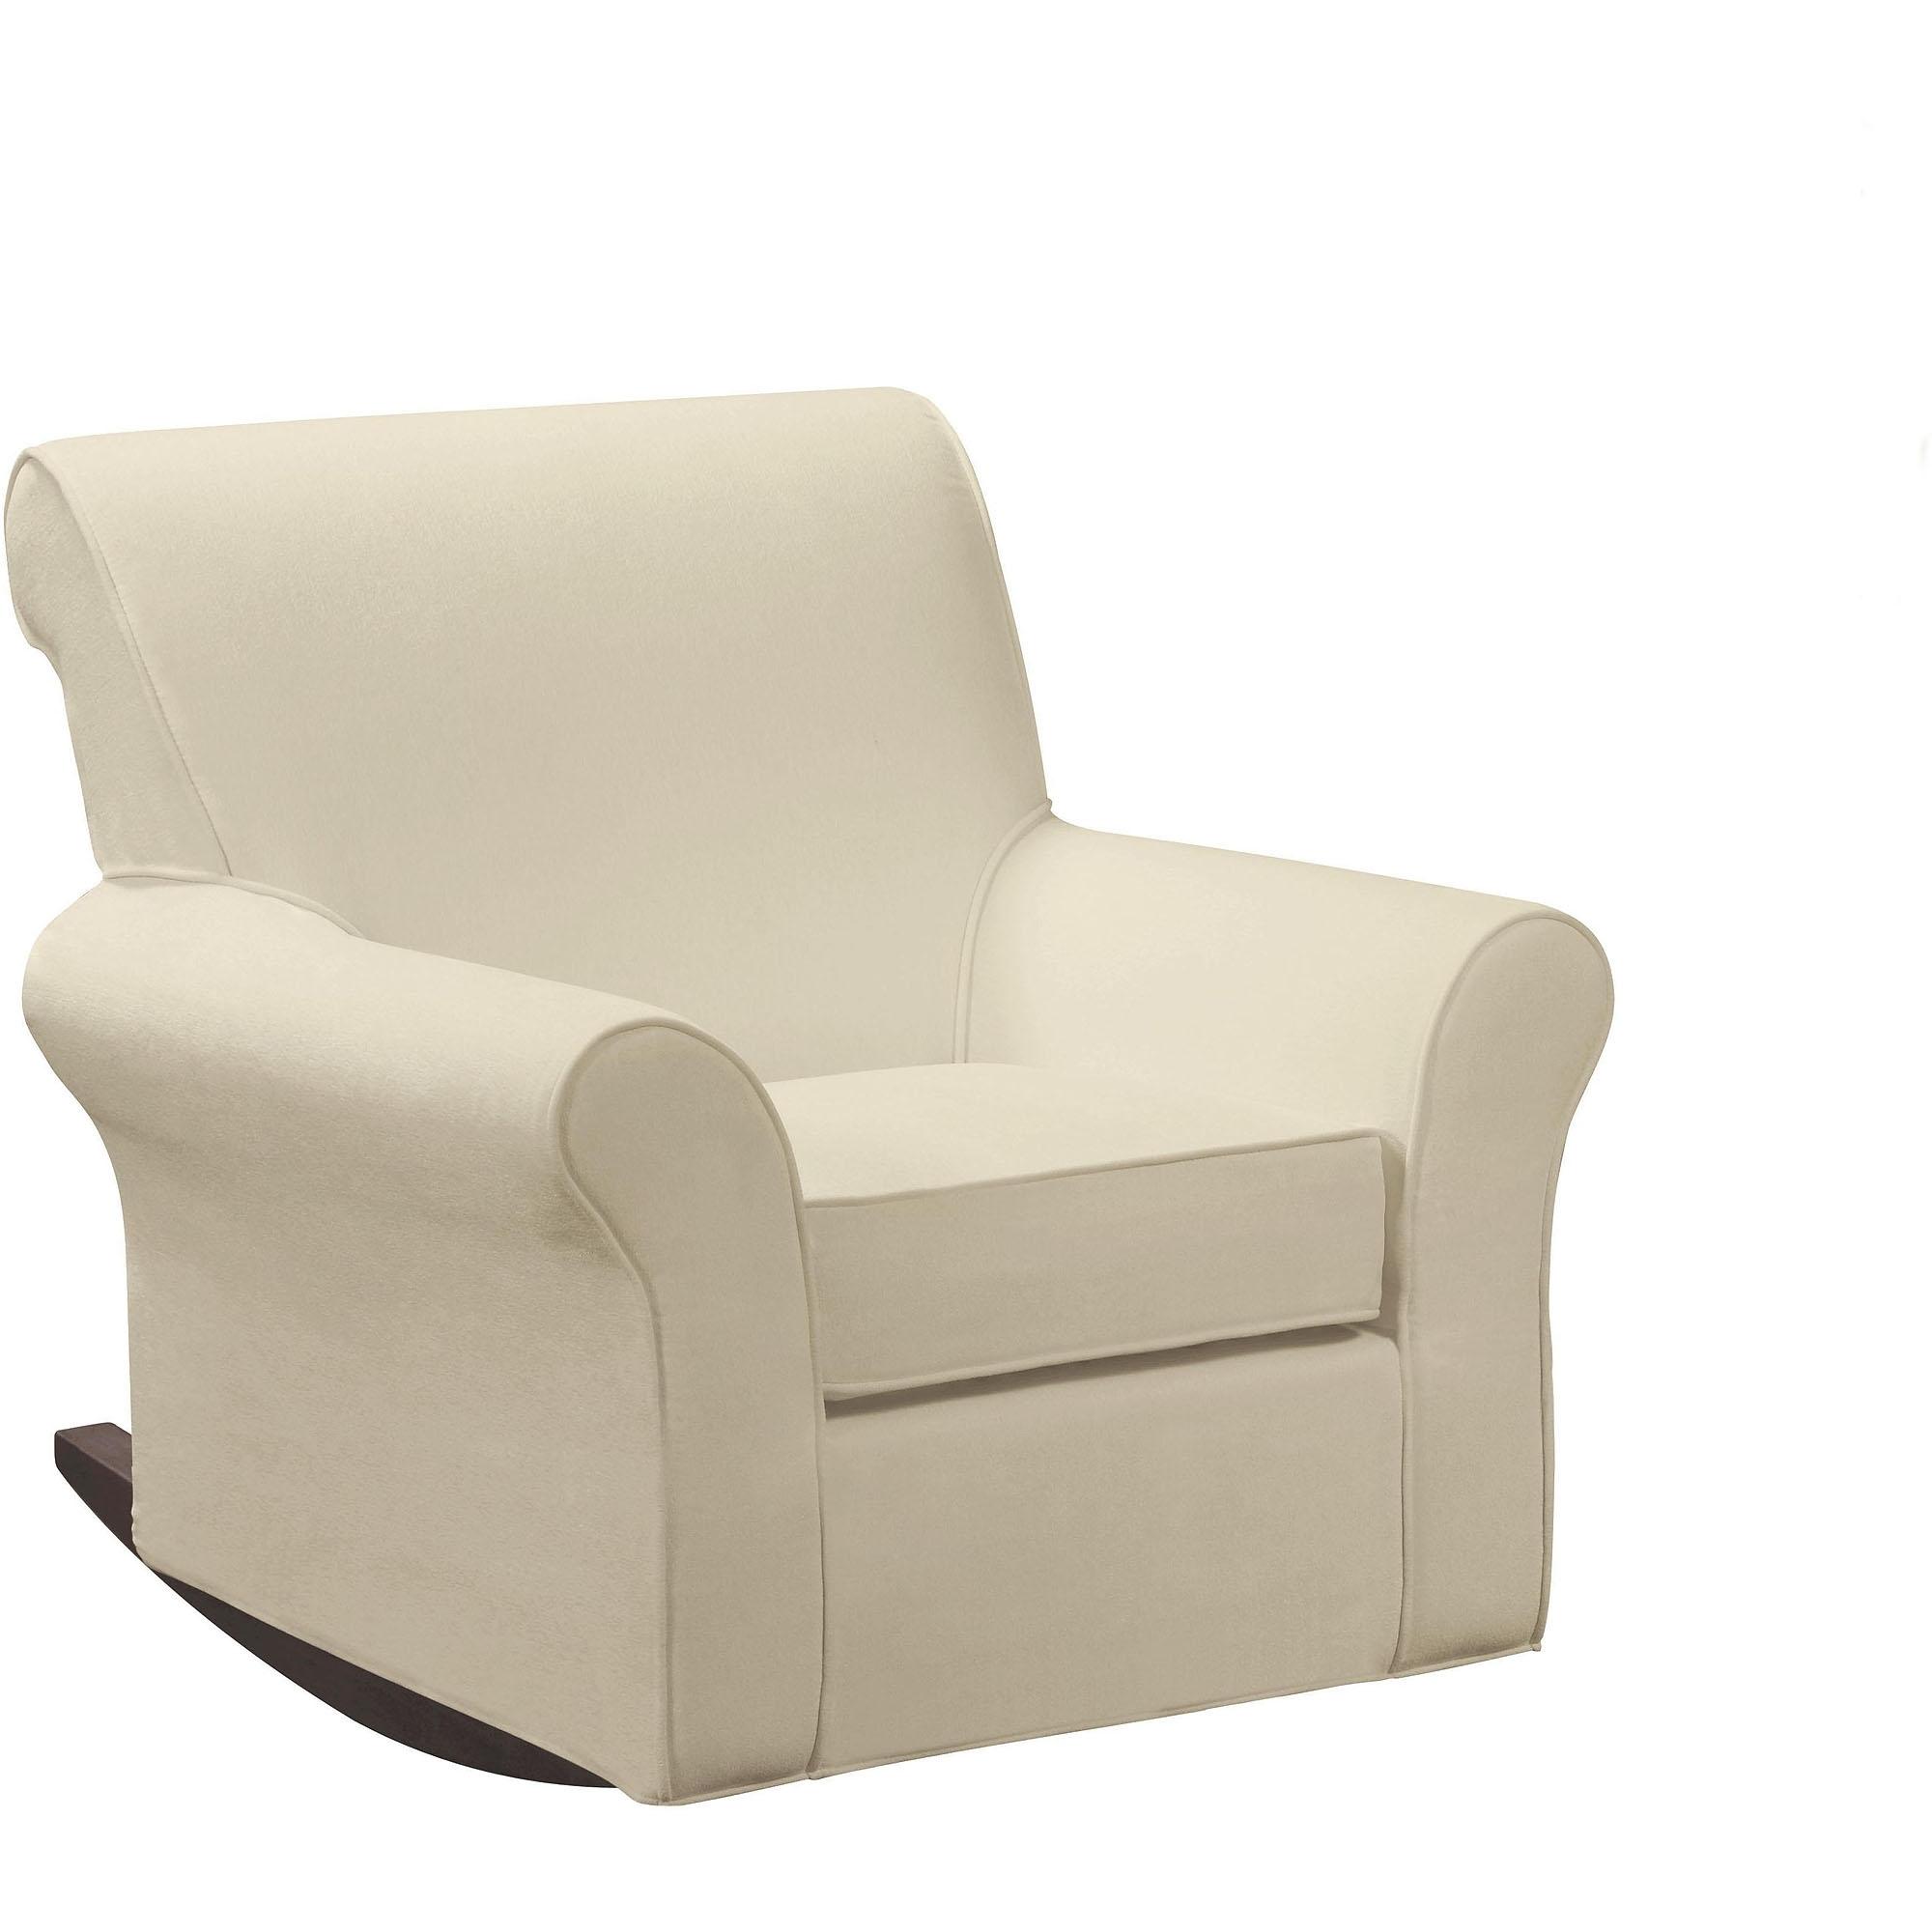 Inspiration about Dorel – Rocking Chair (slipcover Sold Separately) – Walmart Regarding Walmart Rocking Chairs (#8 of 15)